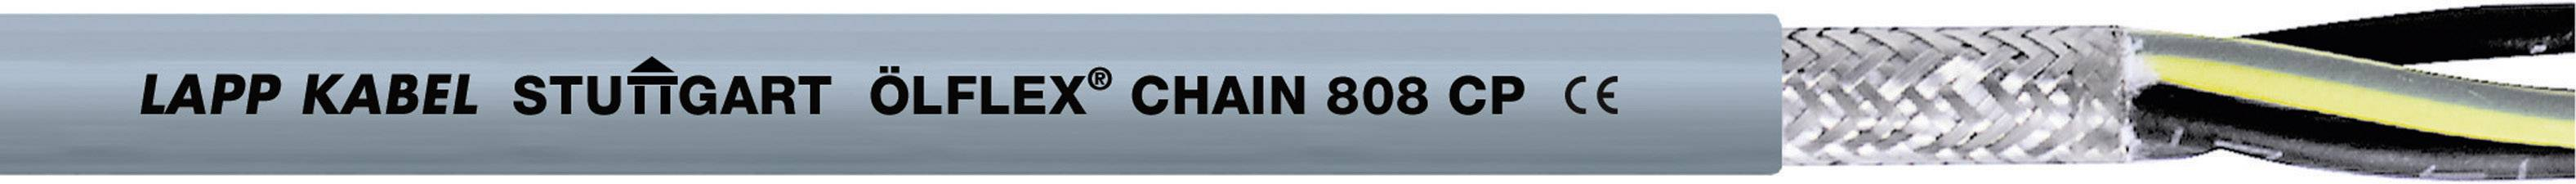 Žíla kabelu LappKabel ÖLFLEX CHAIN 808 CP 2X0,75 (1027759), 2x 0,75 mm², polyurethan, Ø 6,2 mm, stíněný, 100 m